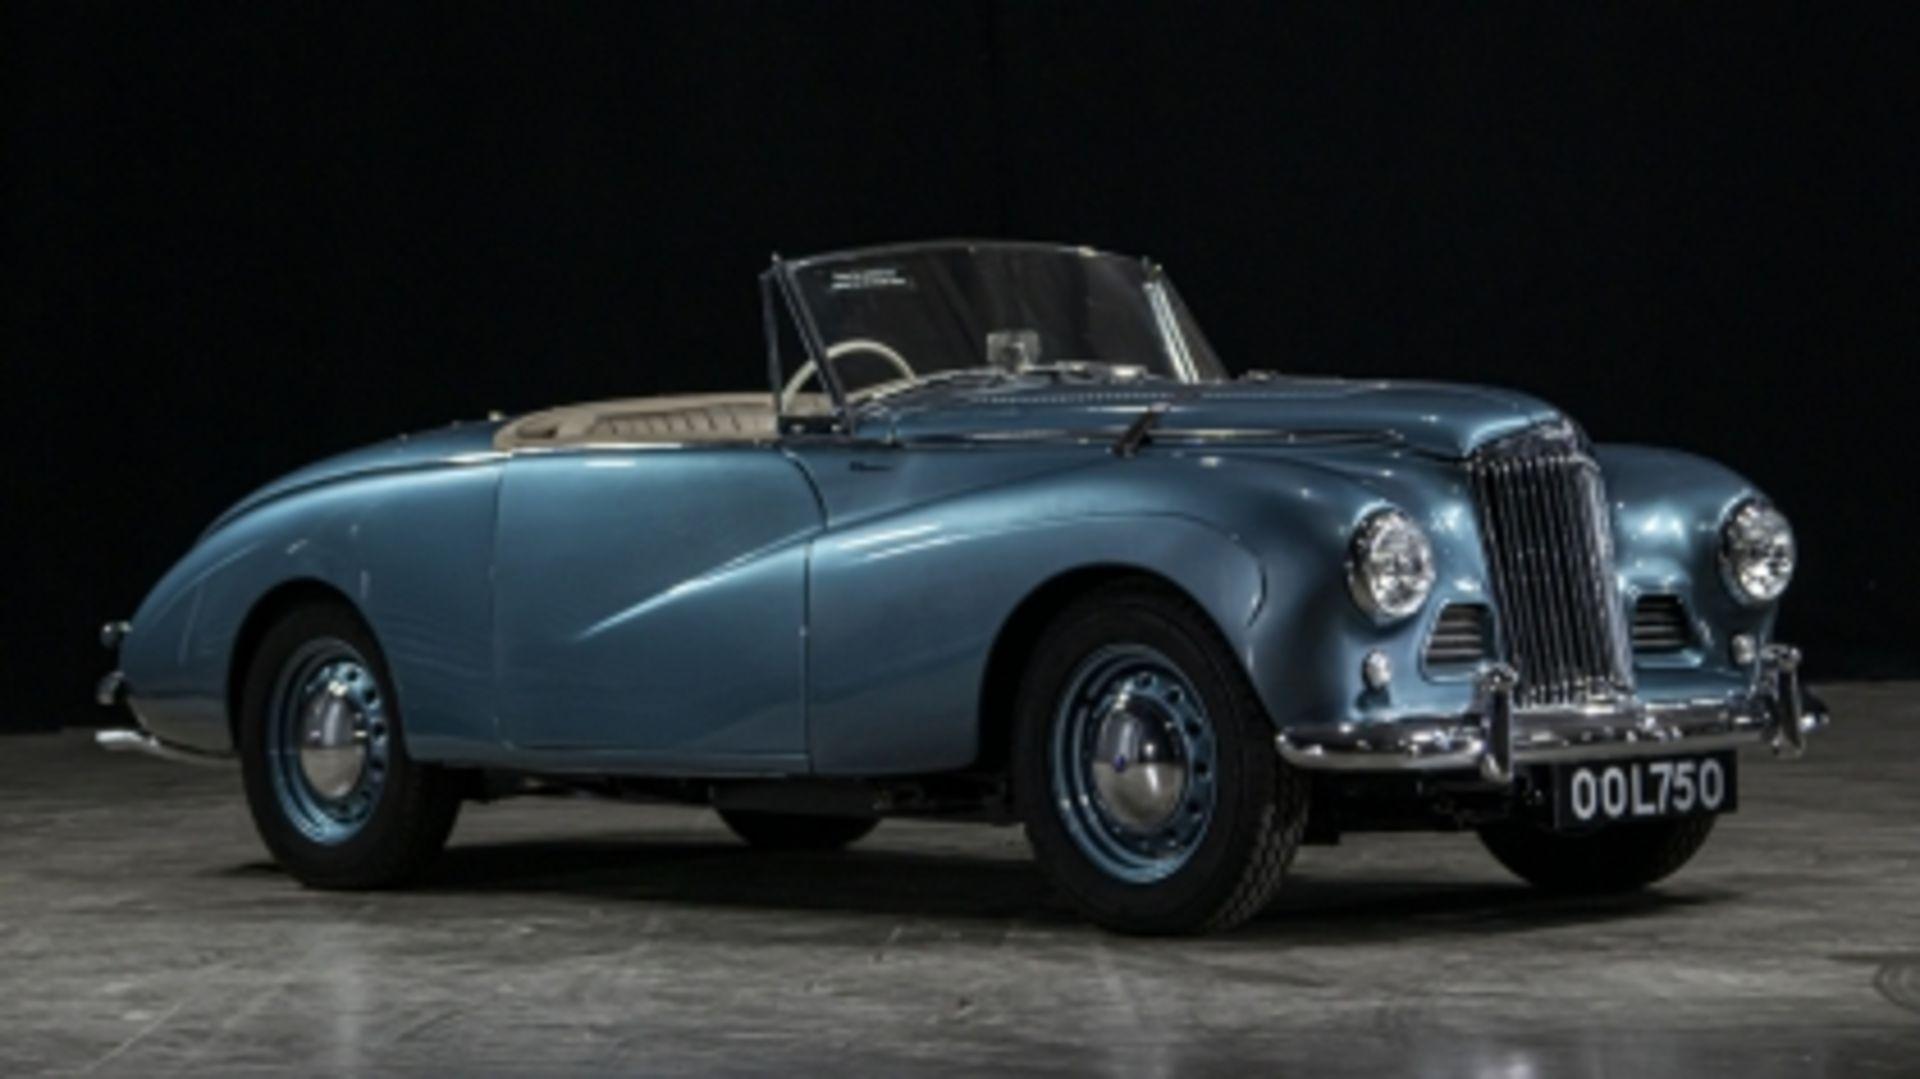 Lot 550 - 1953 Sunbeam Alpine Special